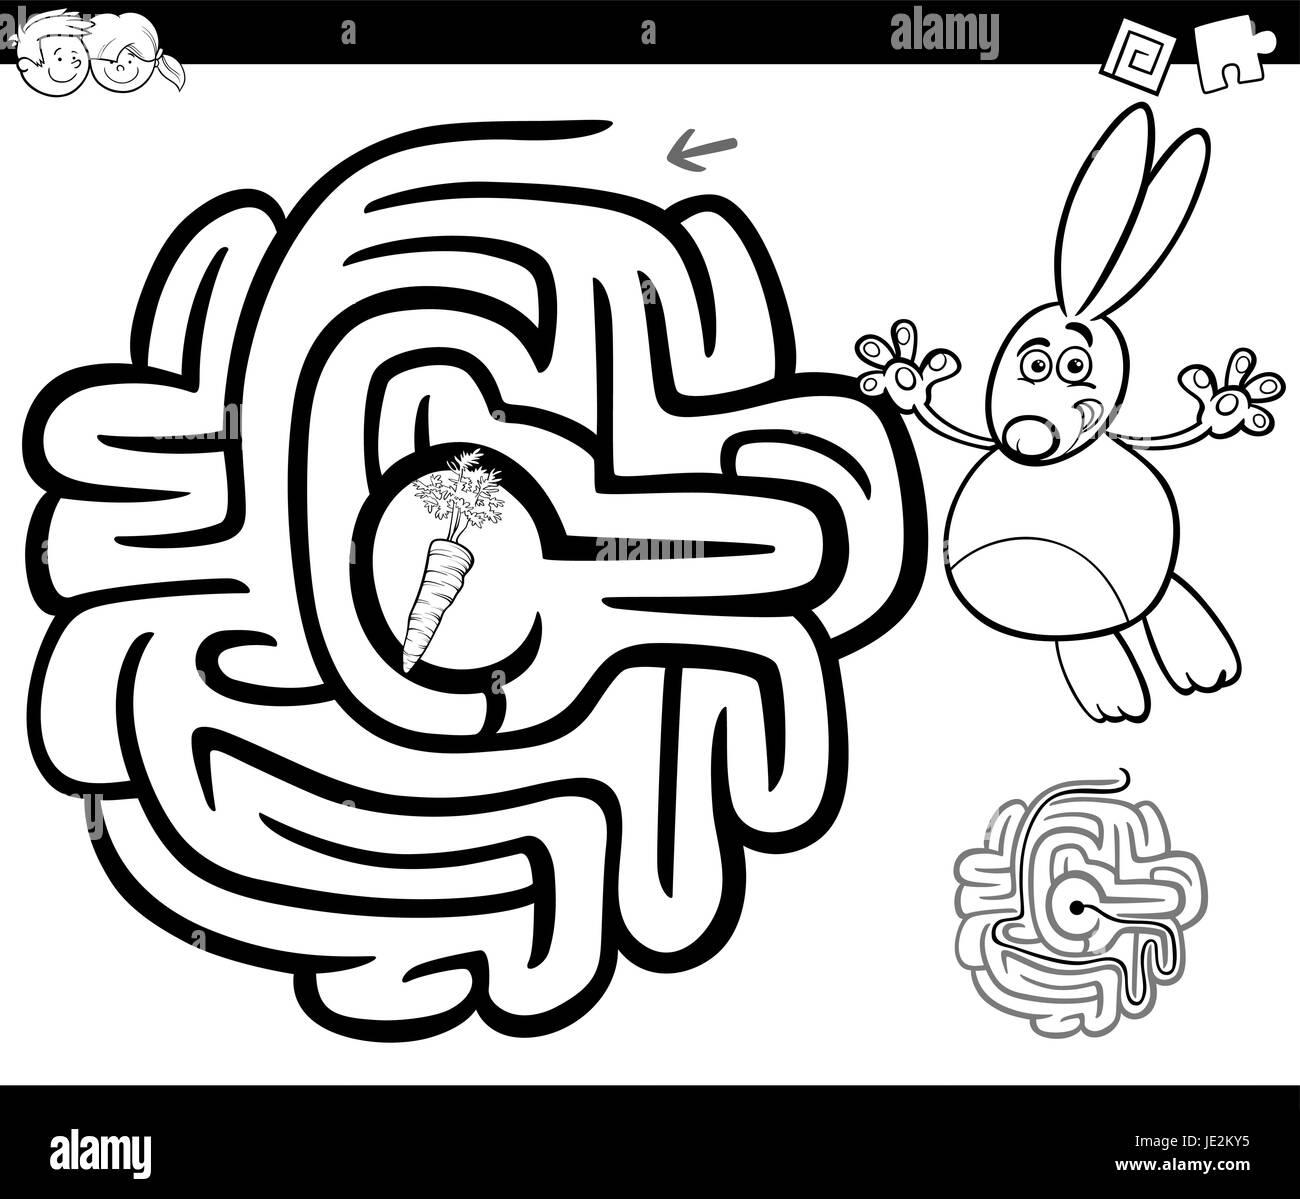 Bunny Rabbit Carrot Illustration Drawing Imágenes De Stock & Bunny ...